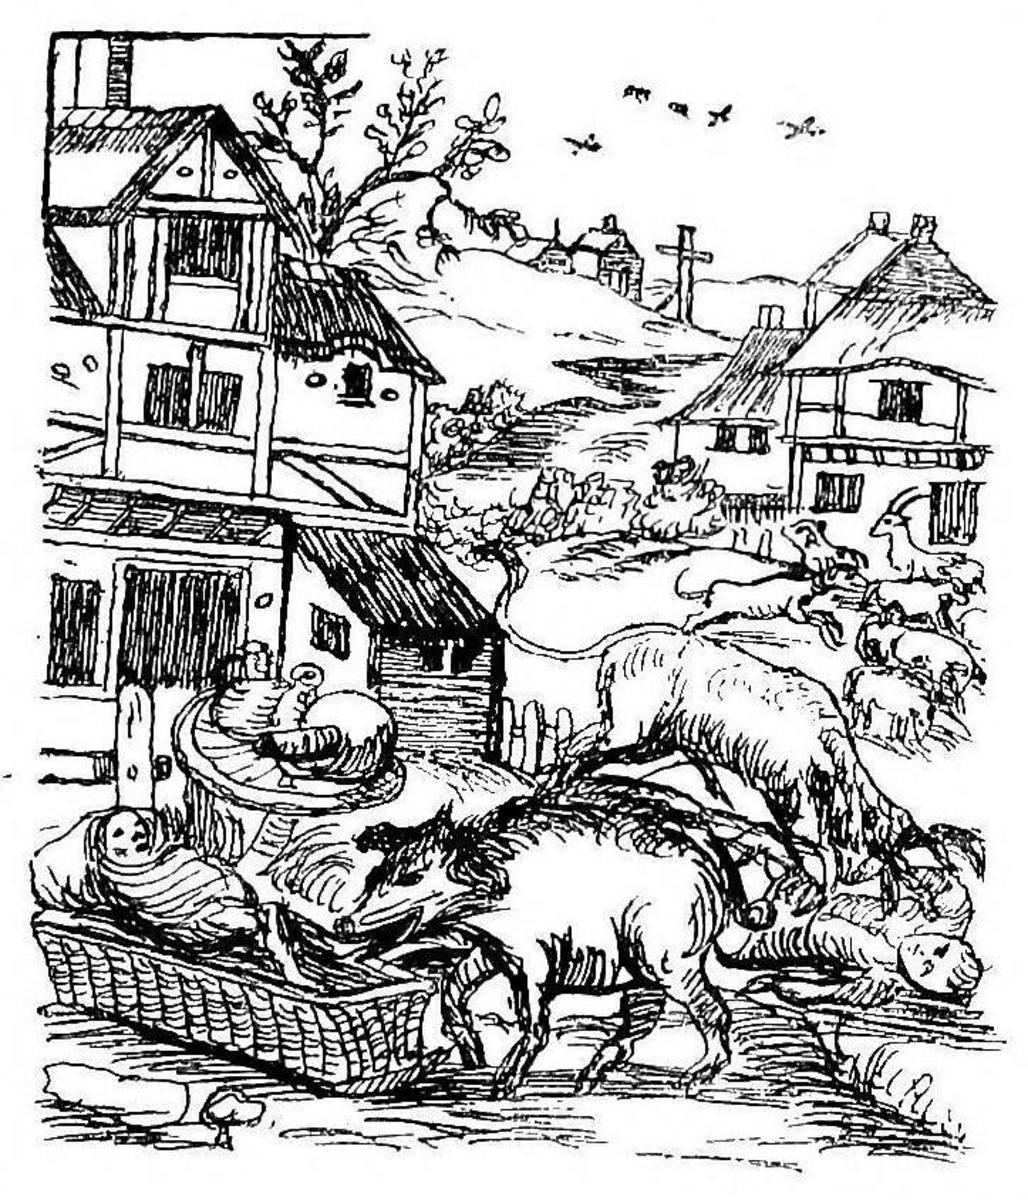 Hogs run amok in a village.